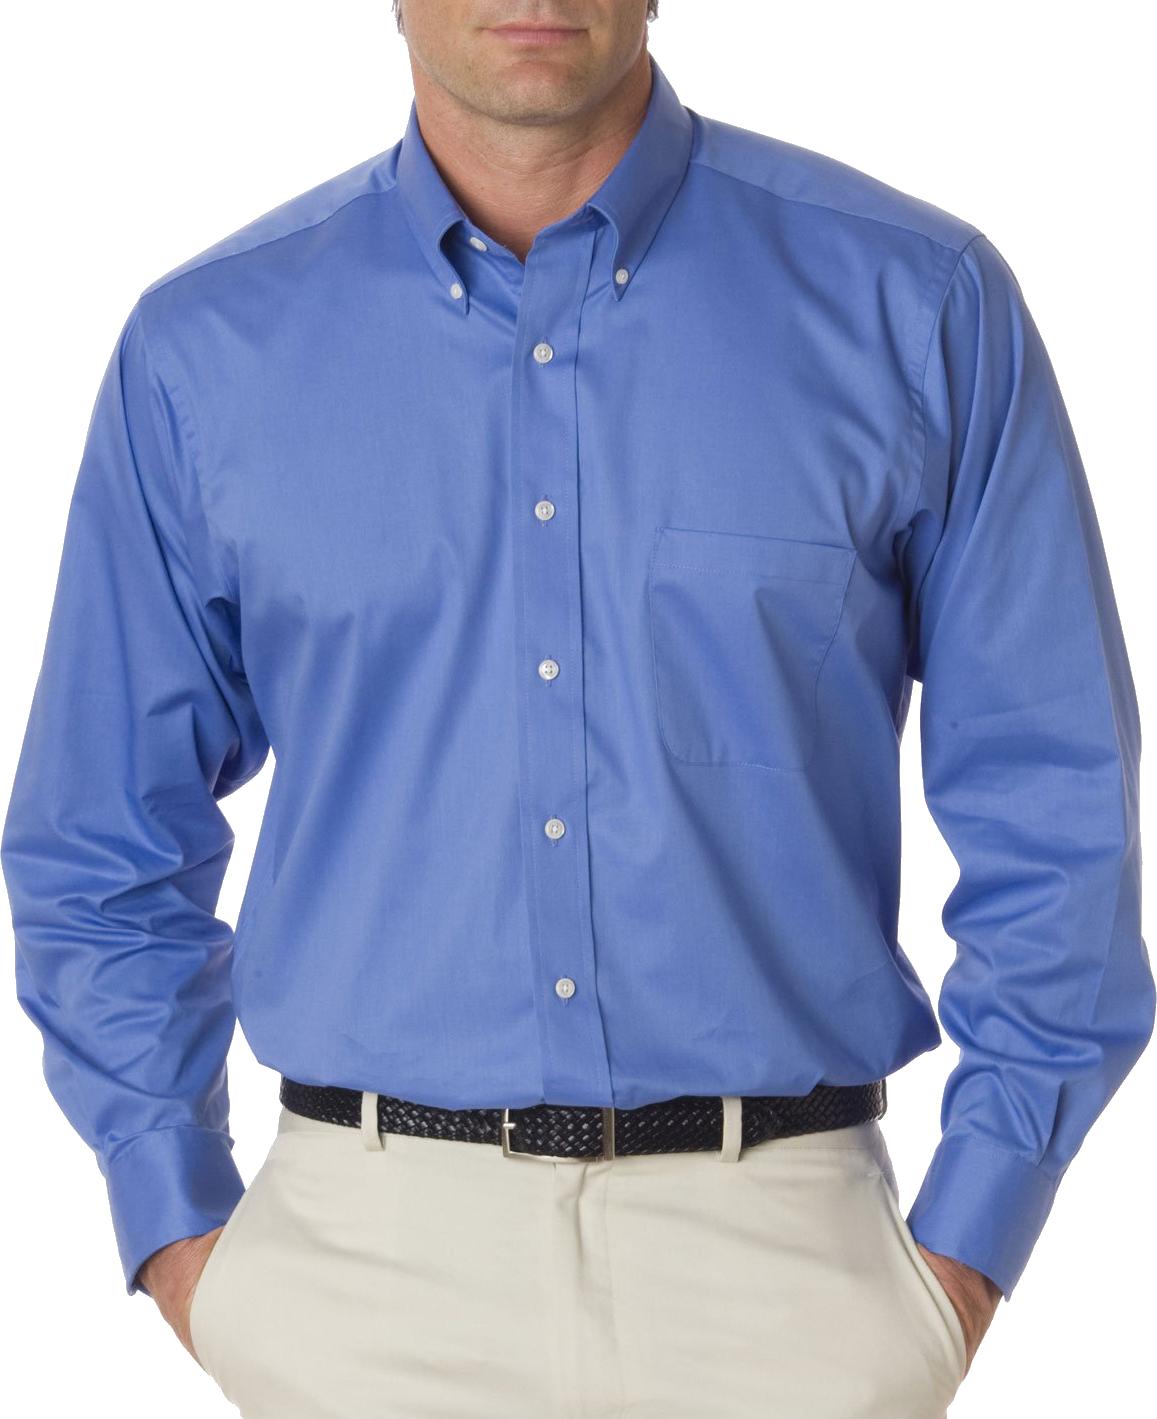 Standard Blue Full Plain Shirt PNG Image